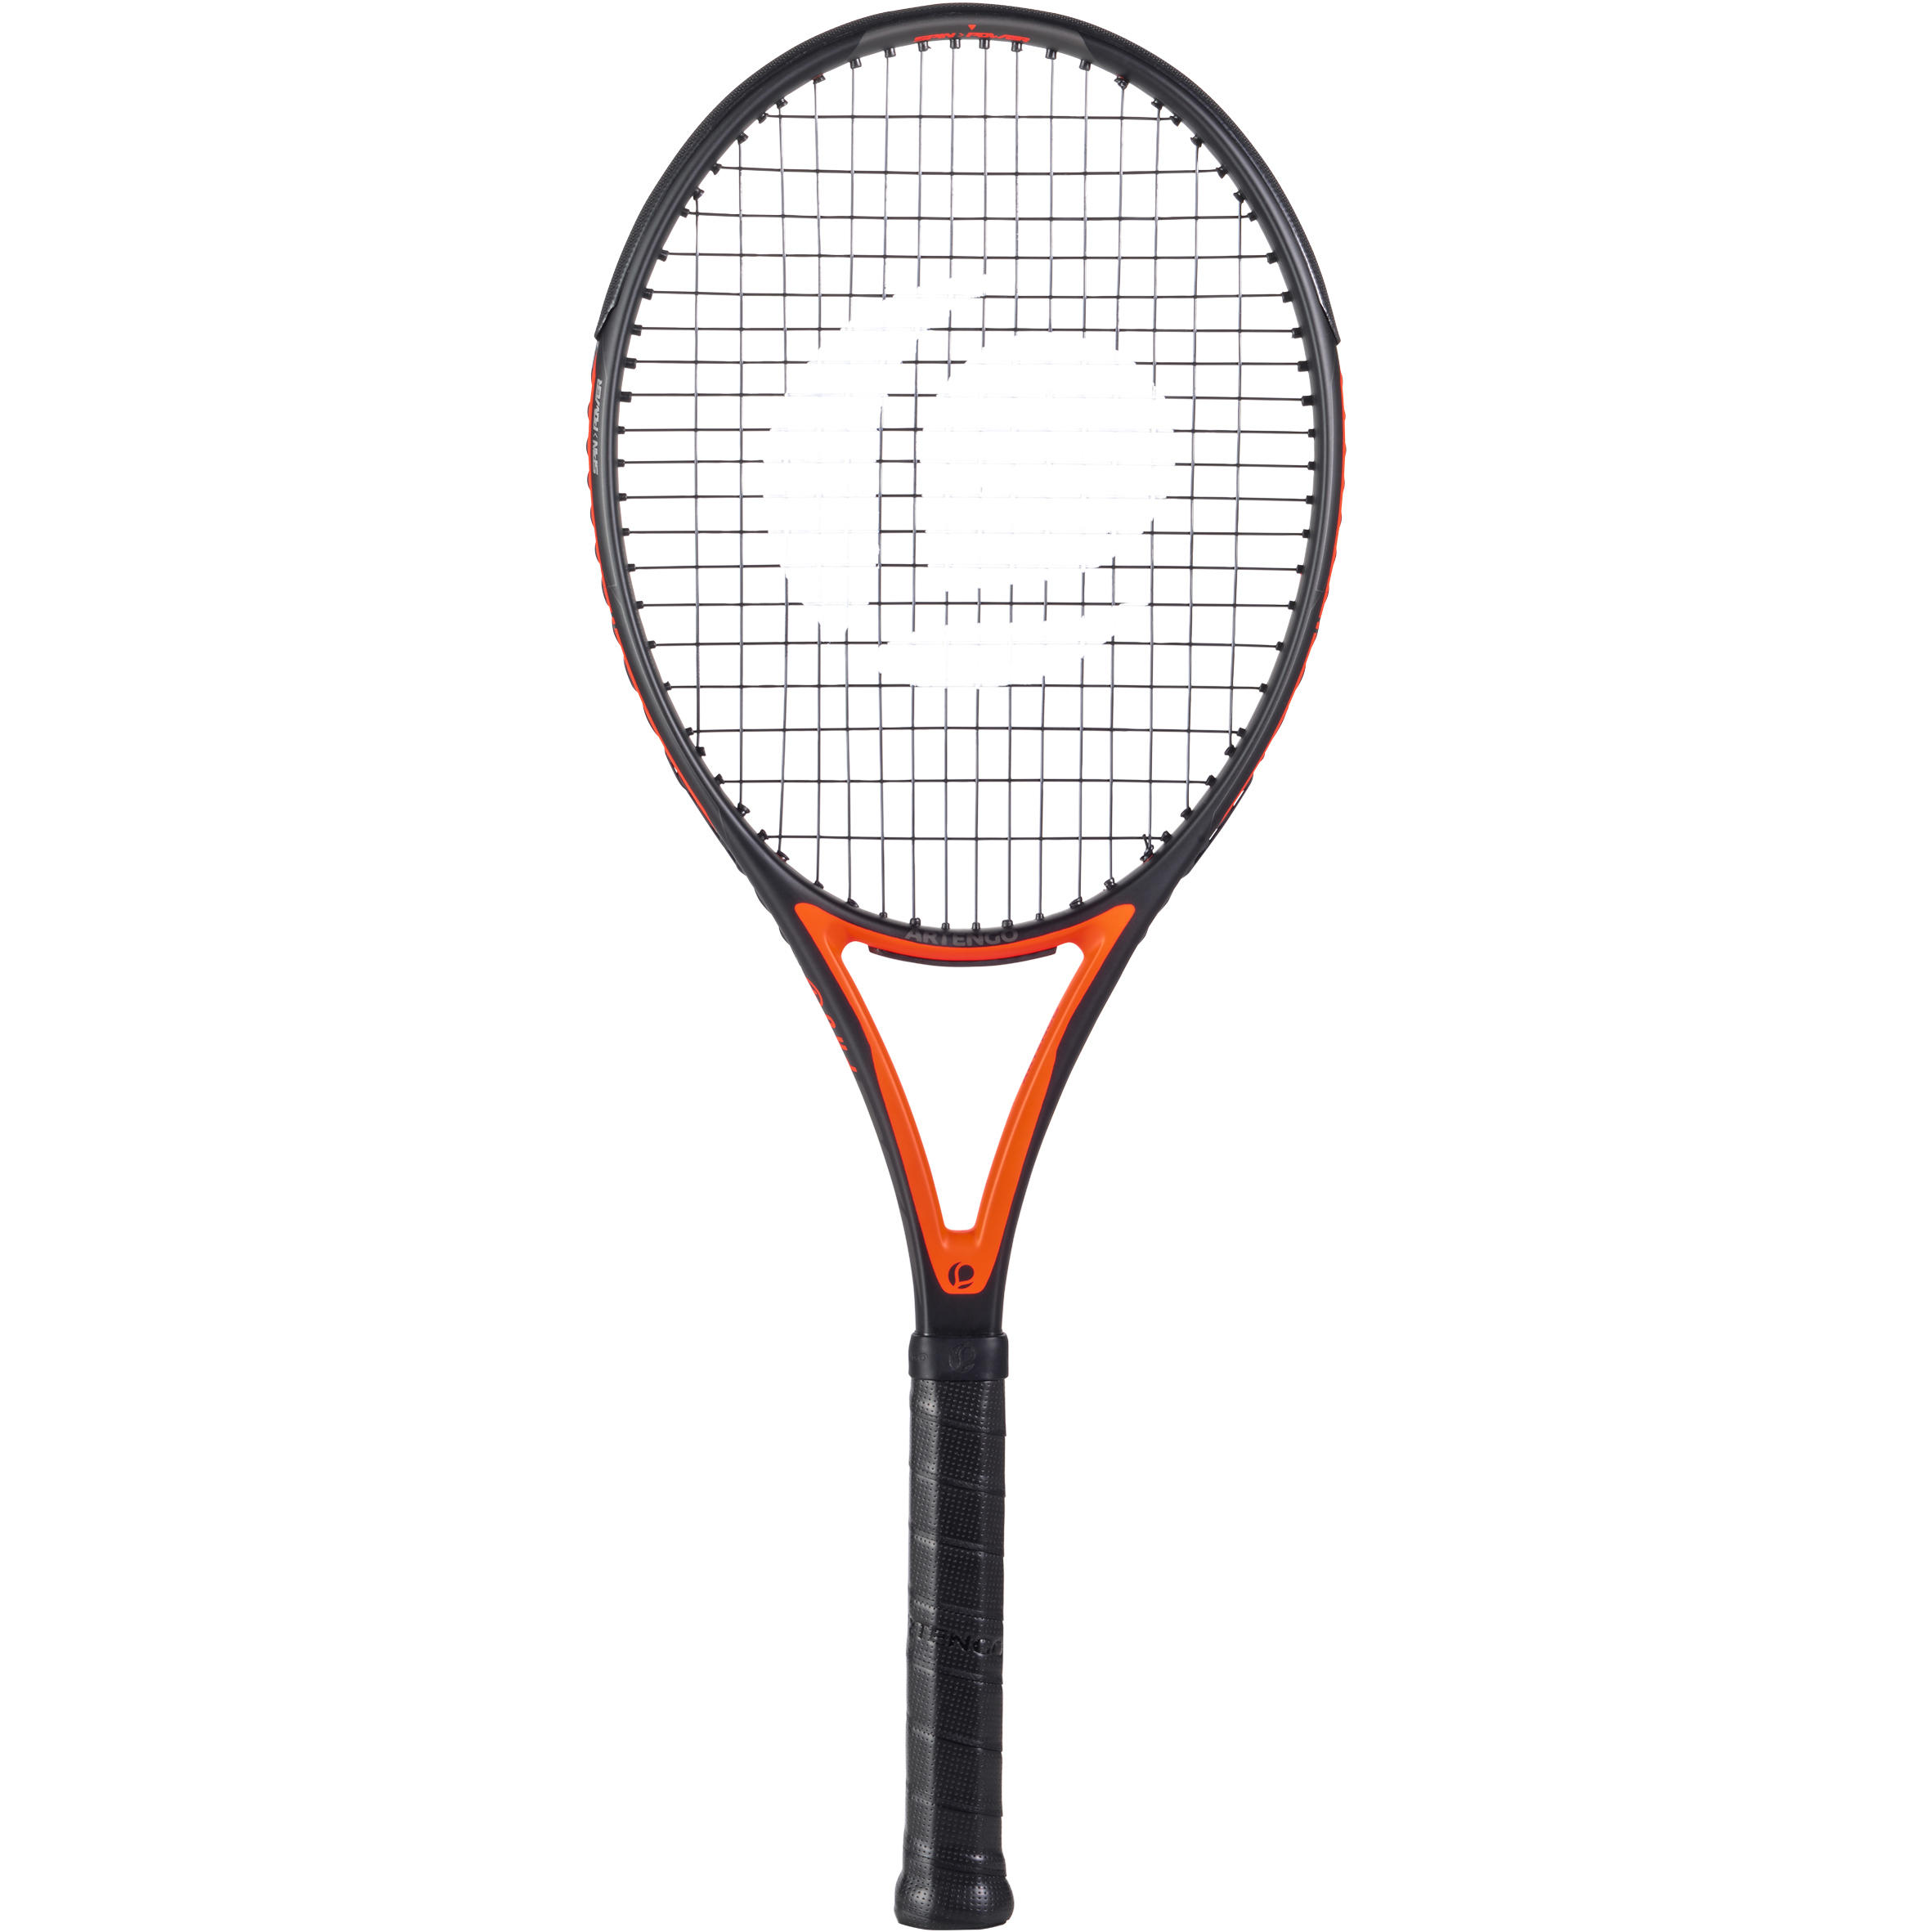 Rachetă Tenis TR990 PRO+